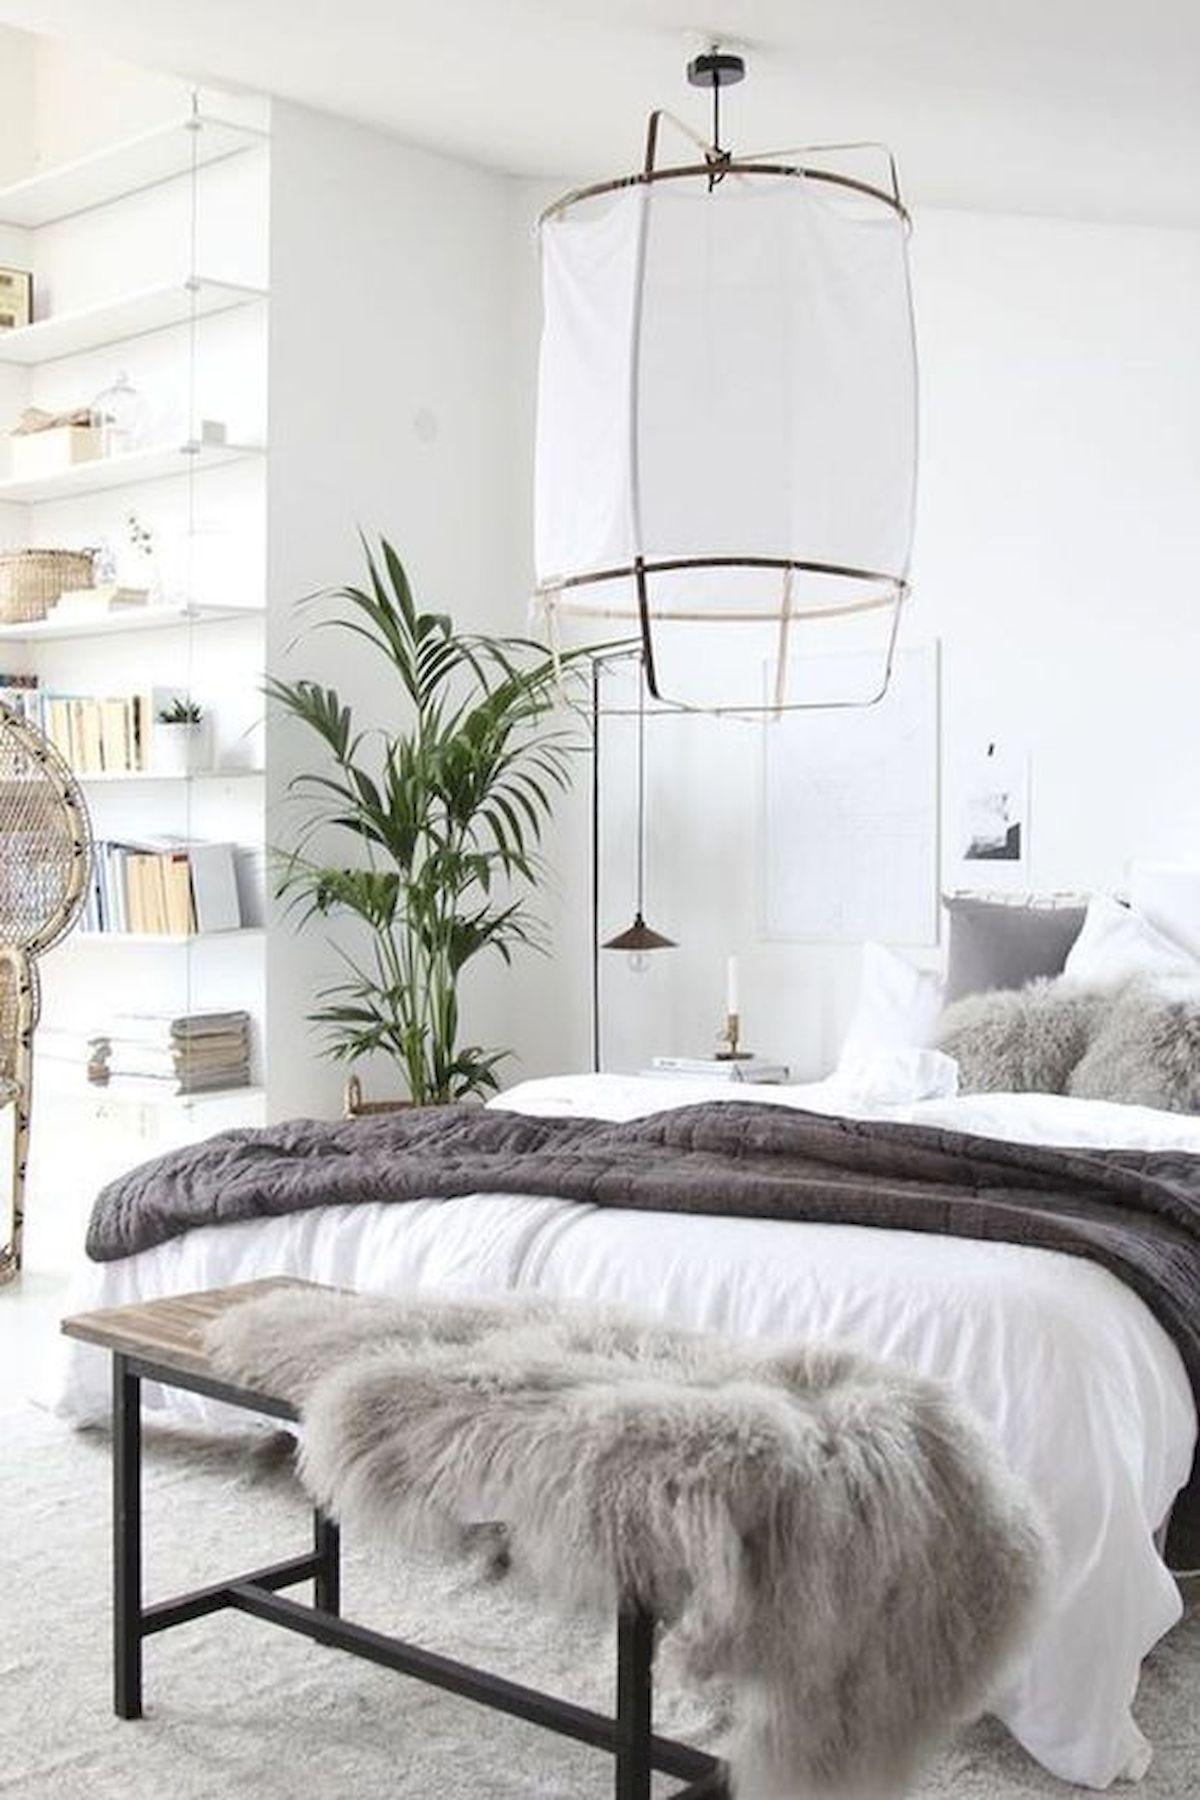 35 Stunning Scandinavian Interior Design and Decor Ideas (3)